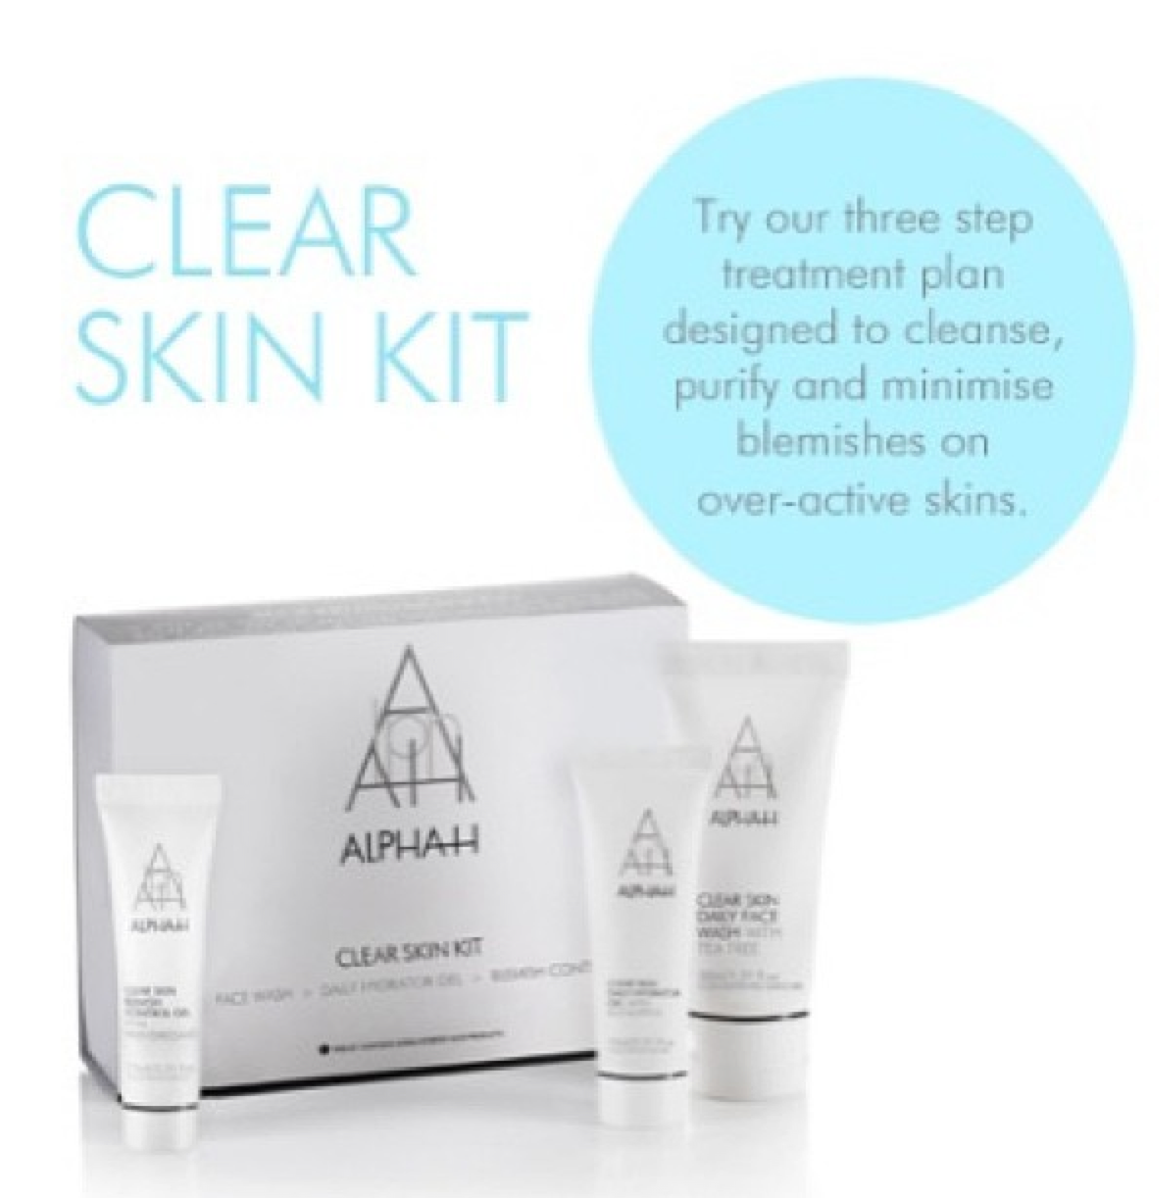 Alpha-H Clear Skin Kit